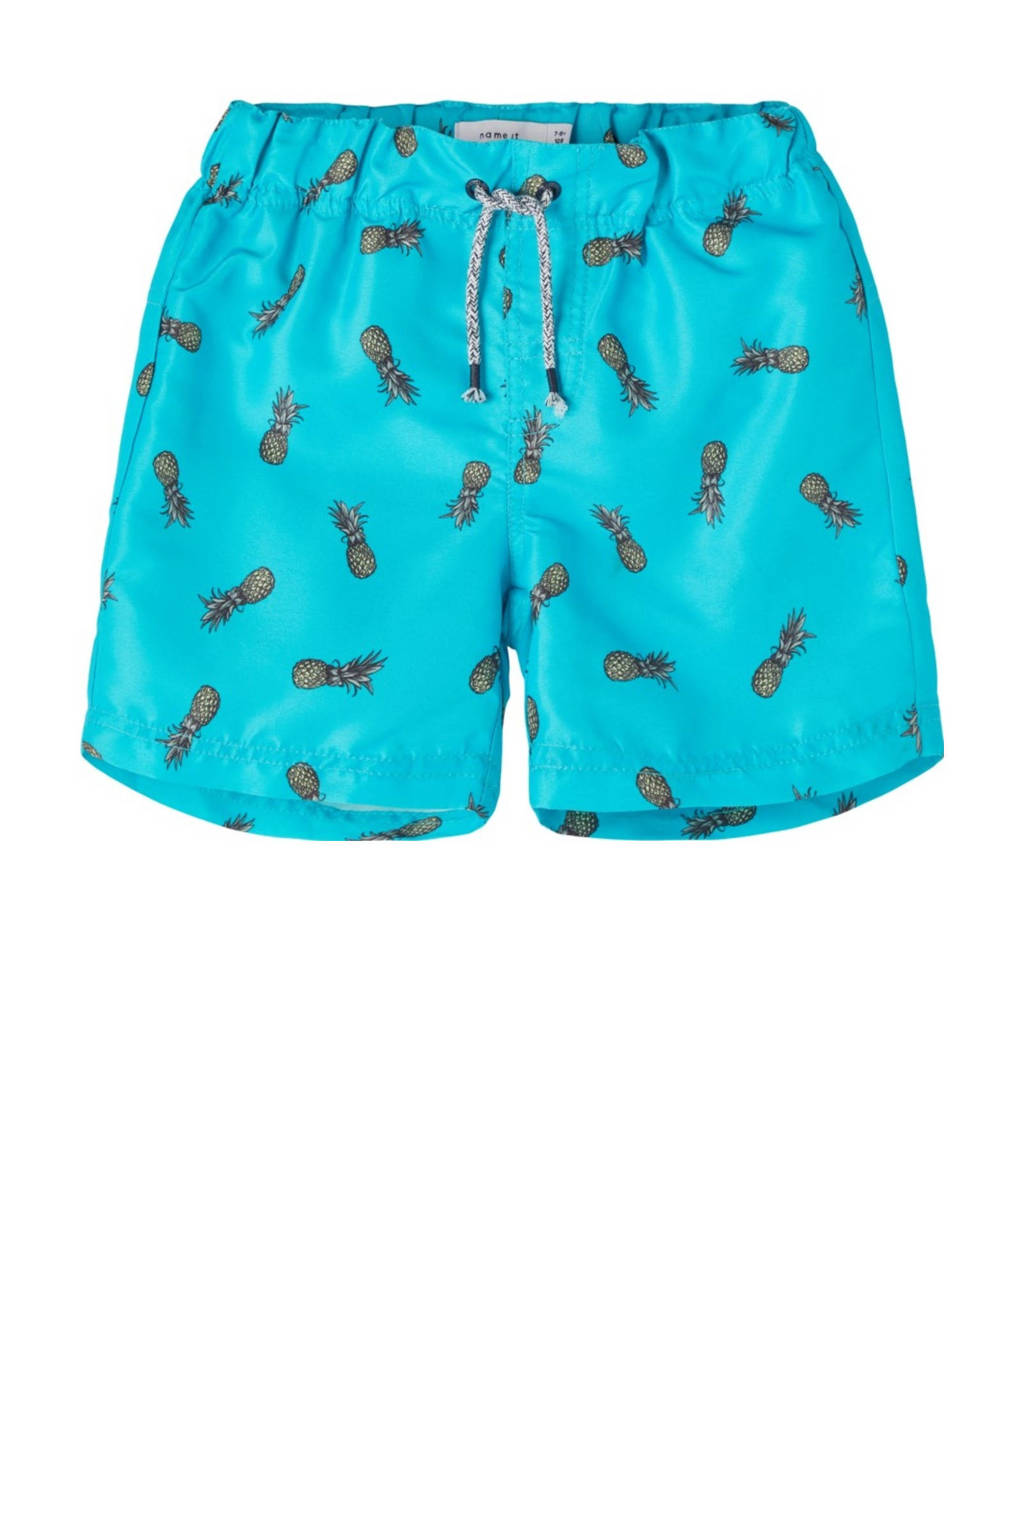 NAME IT KIDS zwemshort Zenneth turquoise, Turquoise